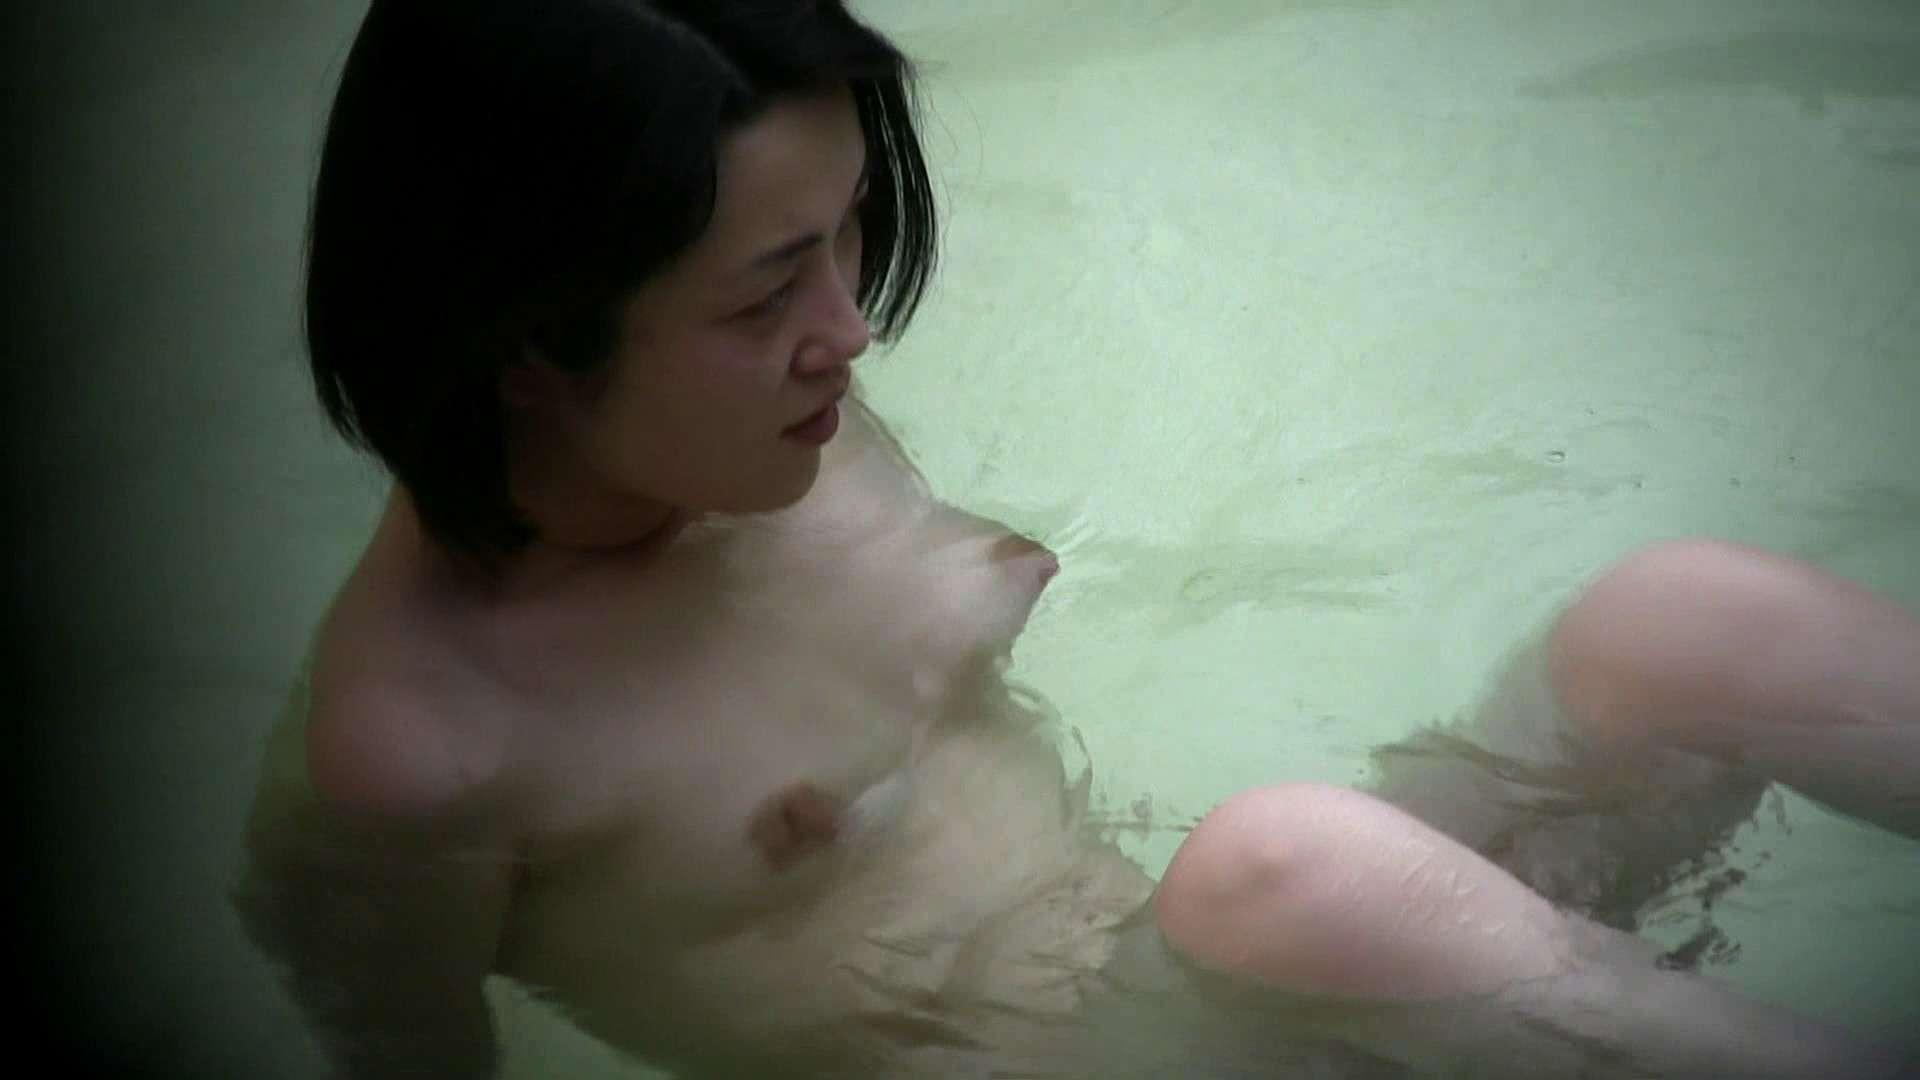 Aquaな露天風呂Vol.651 露天風呂突入   美しいOLの裸体  74pic 13